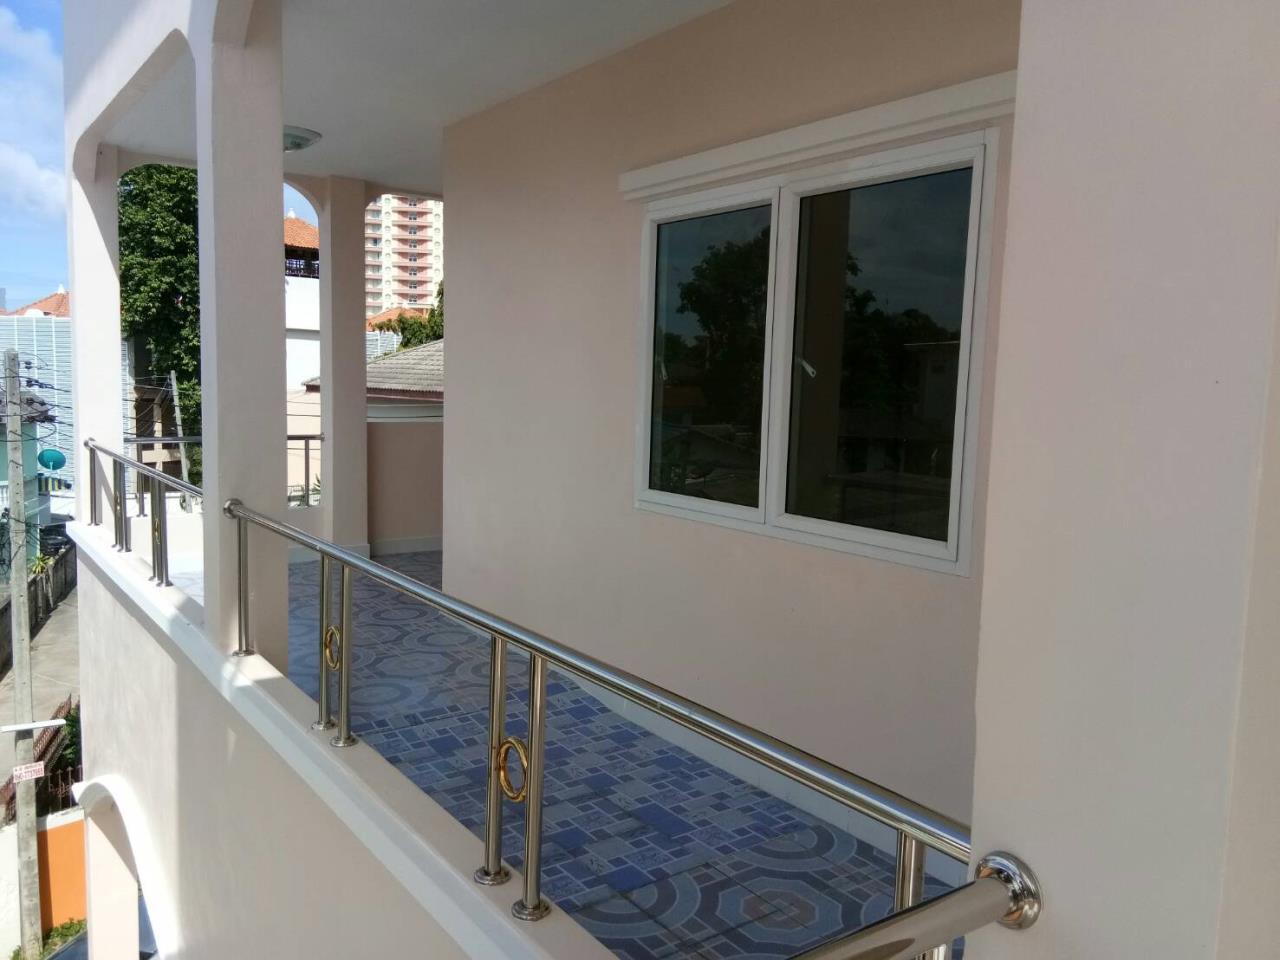 Agent - Thammajak Agency's Sale building 3 floors Pattaya Nakluea 16 Alley, near Wongamat beach Pattaya 13